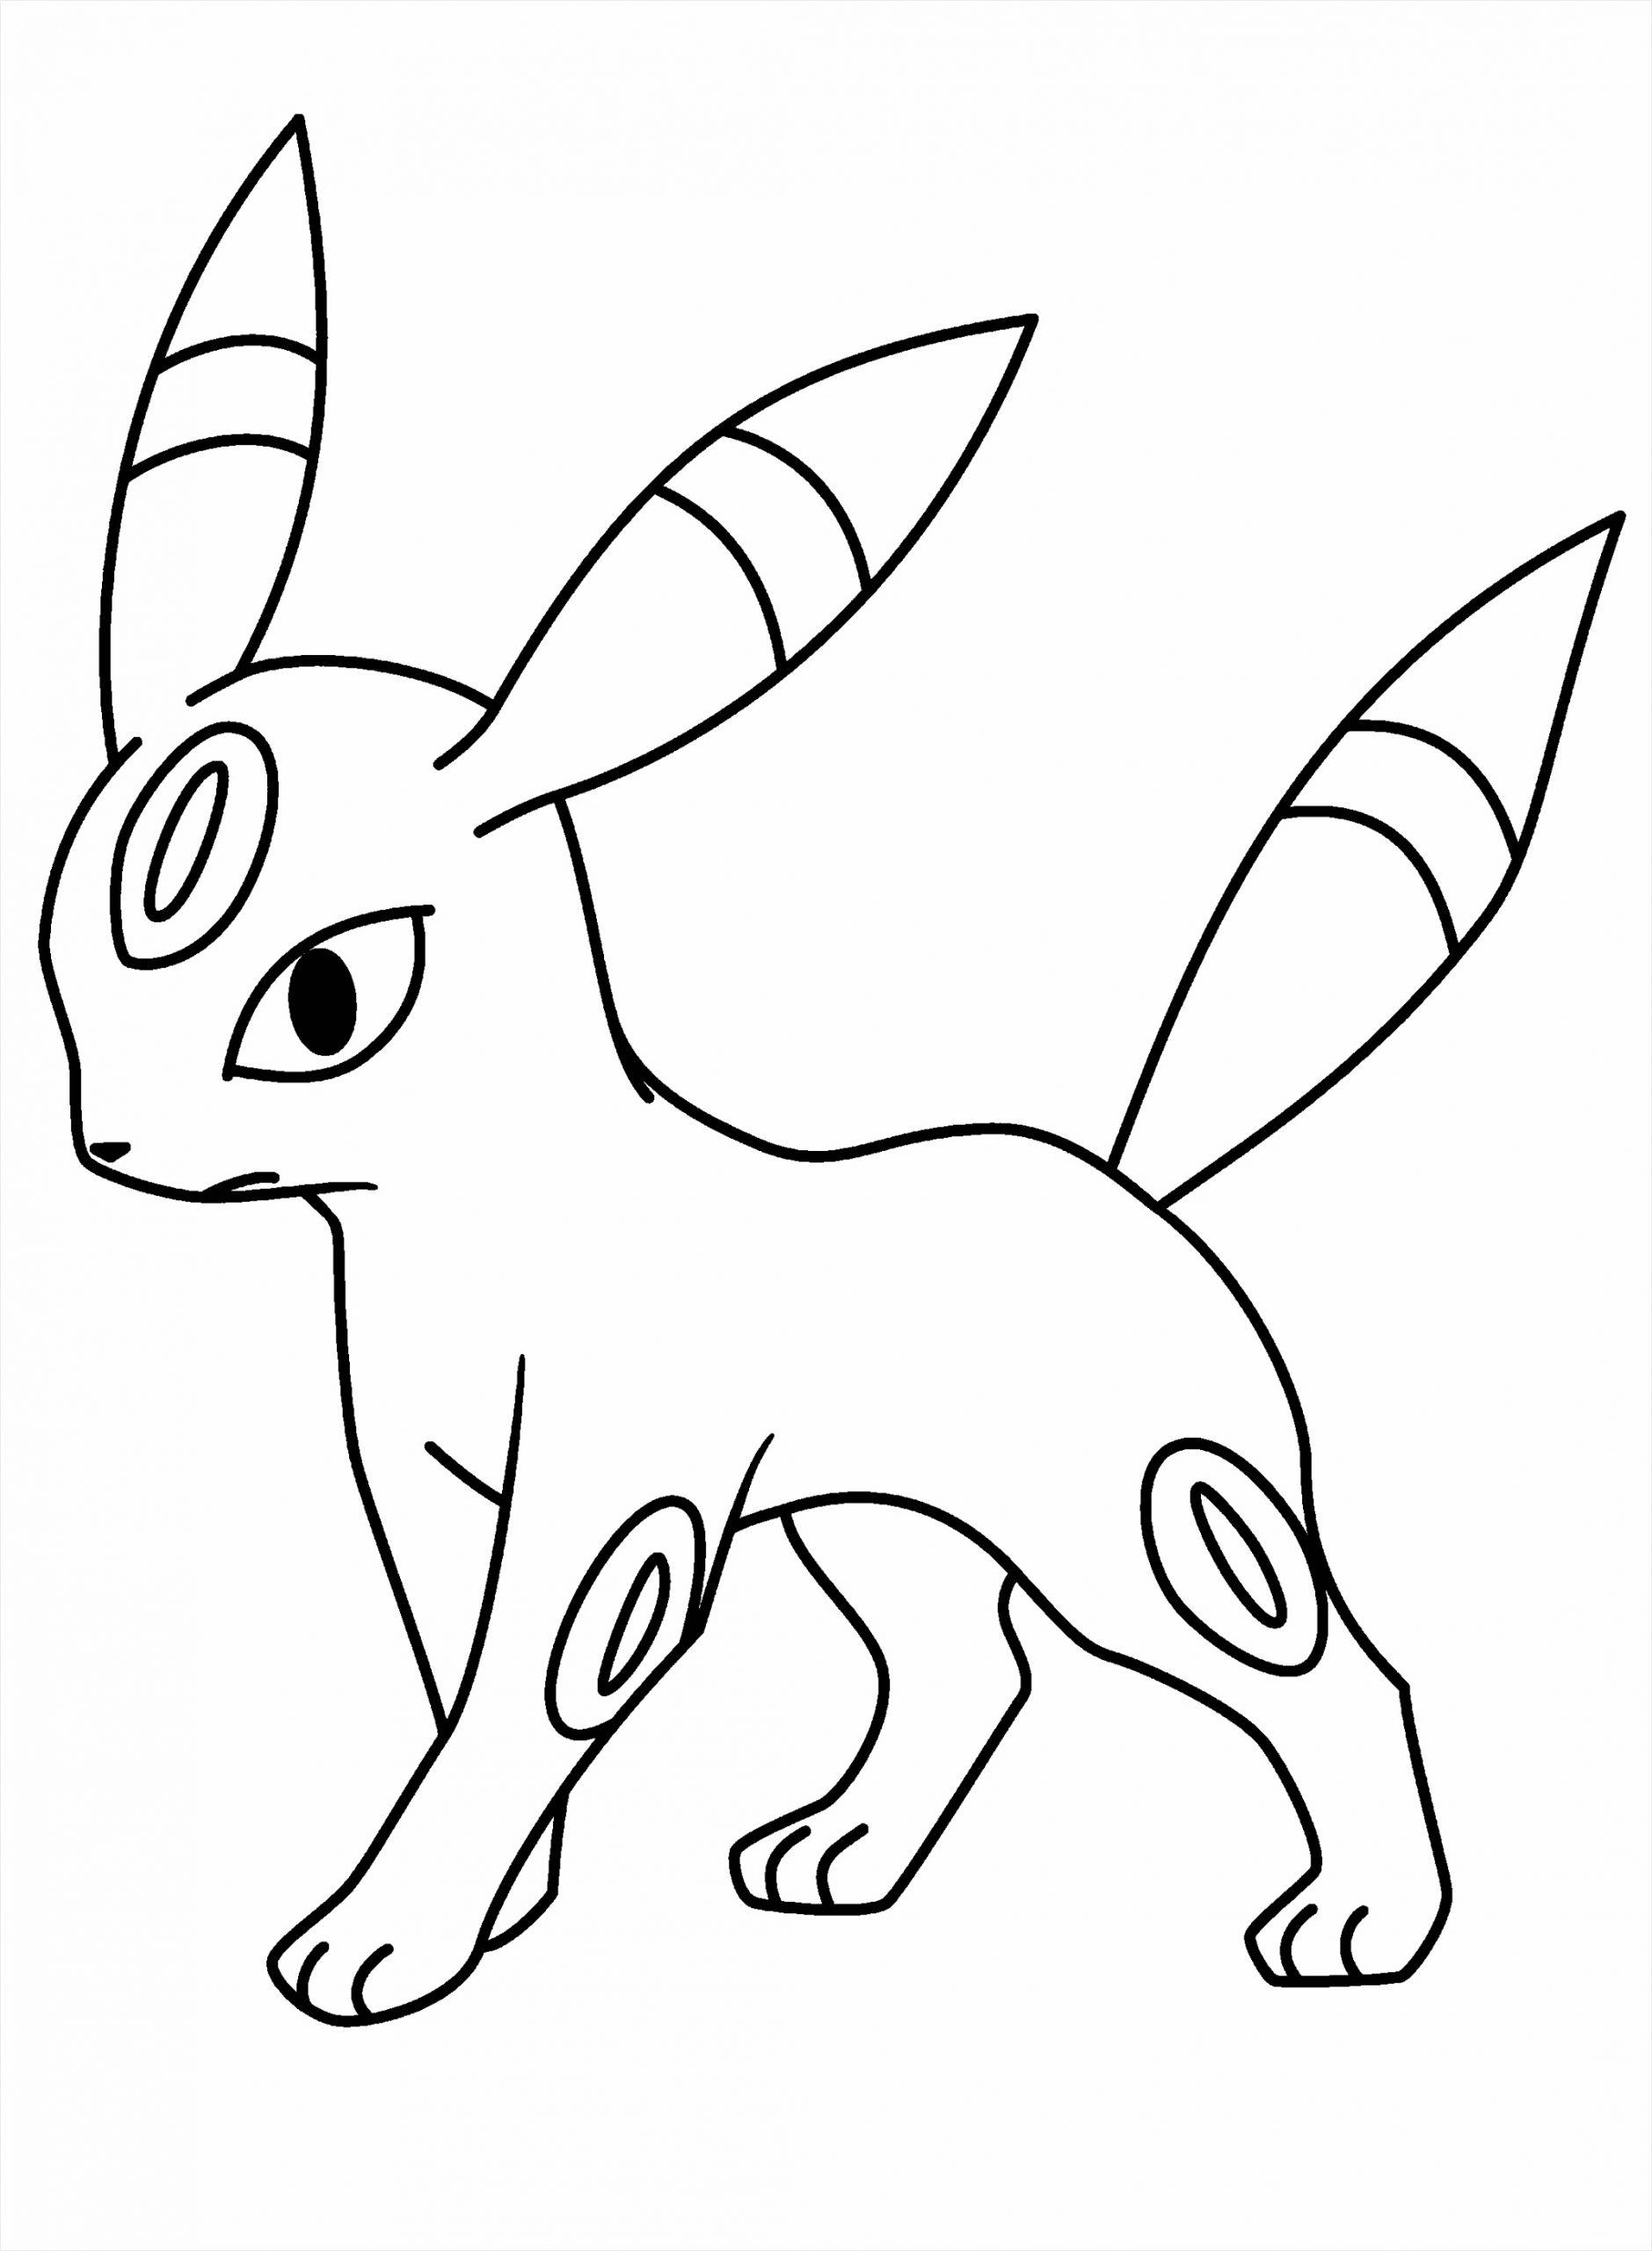 dibujo para colorear pokemon imagen animada 0405 escpu